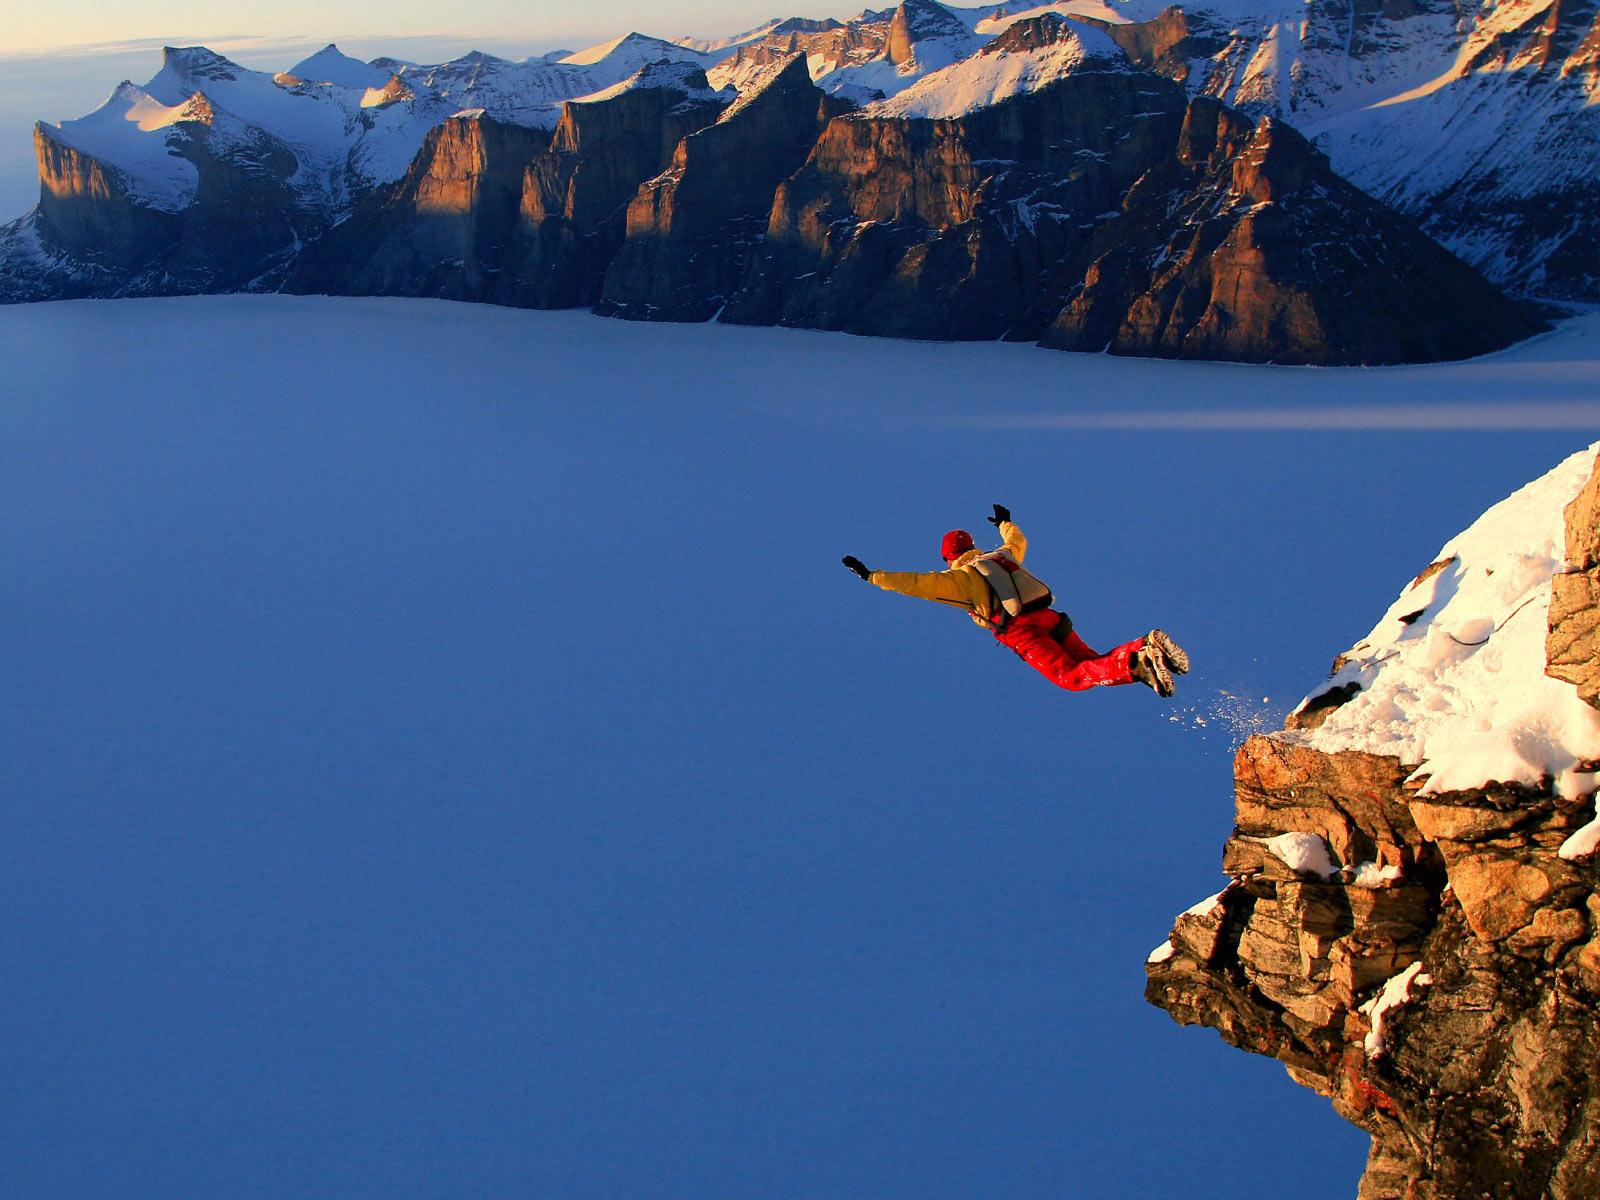 http://4.bp.blogspot.com/-uQSc86PsKHI/Tlxs_xaeB3I/AAAAAAAABXQ/HNkJdv6g_R8/s1600/Extreme_sport_from_rock_climbing_to_mountain_parachuting.jpg